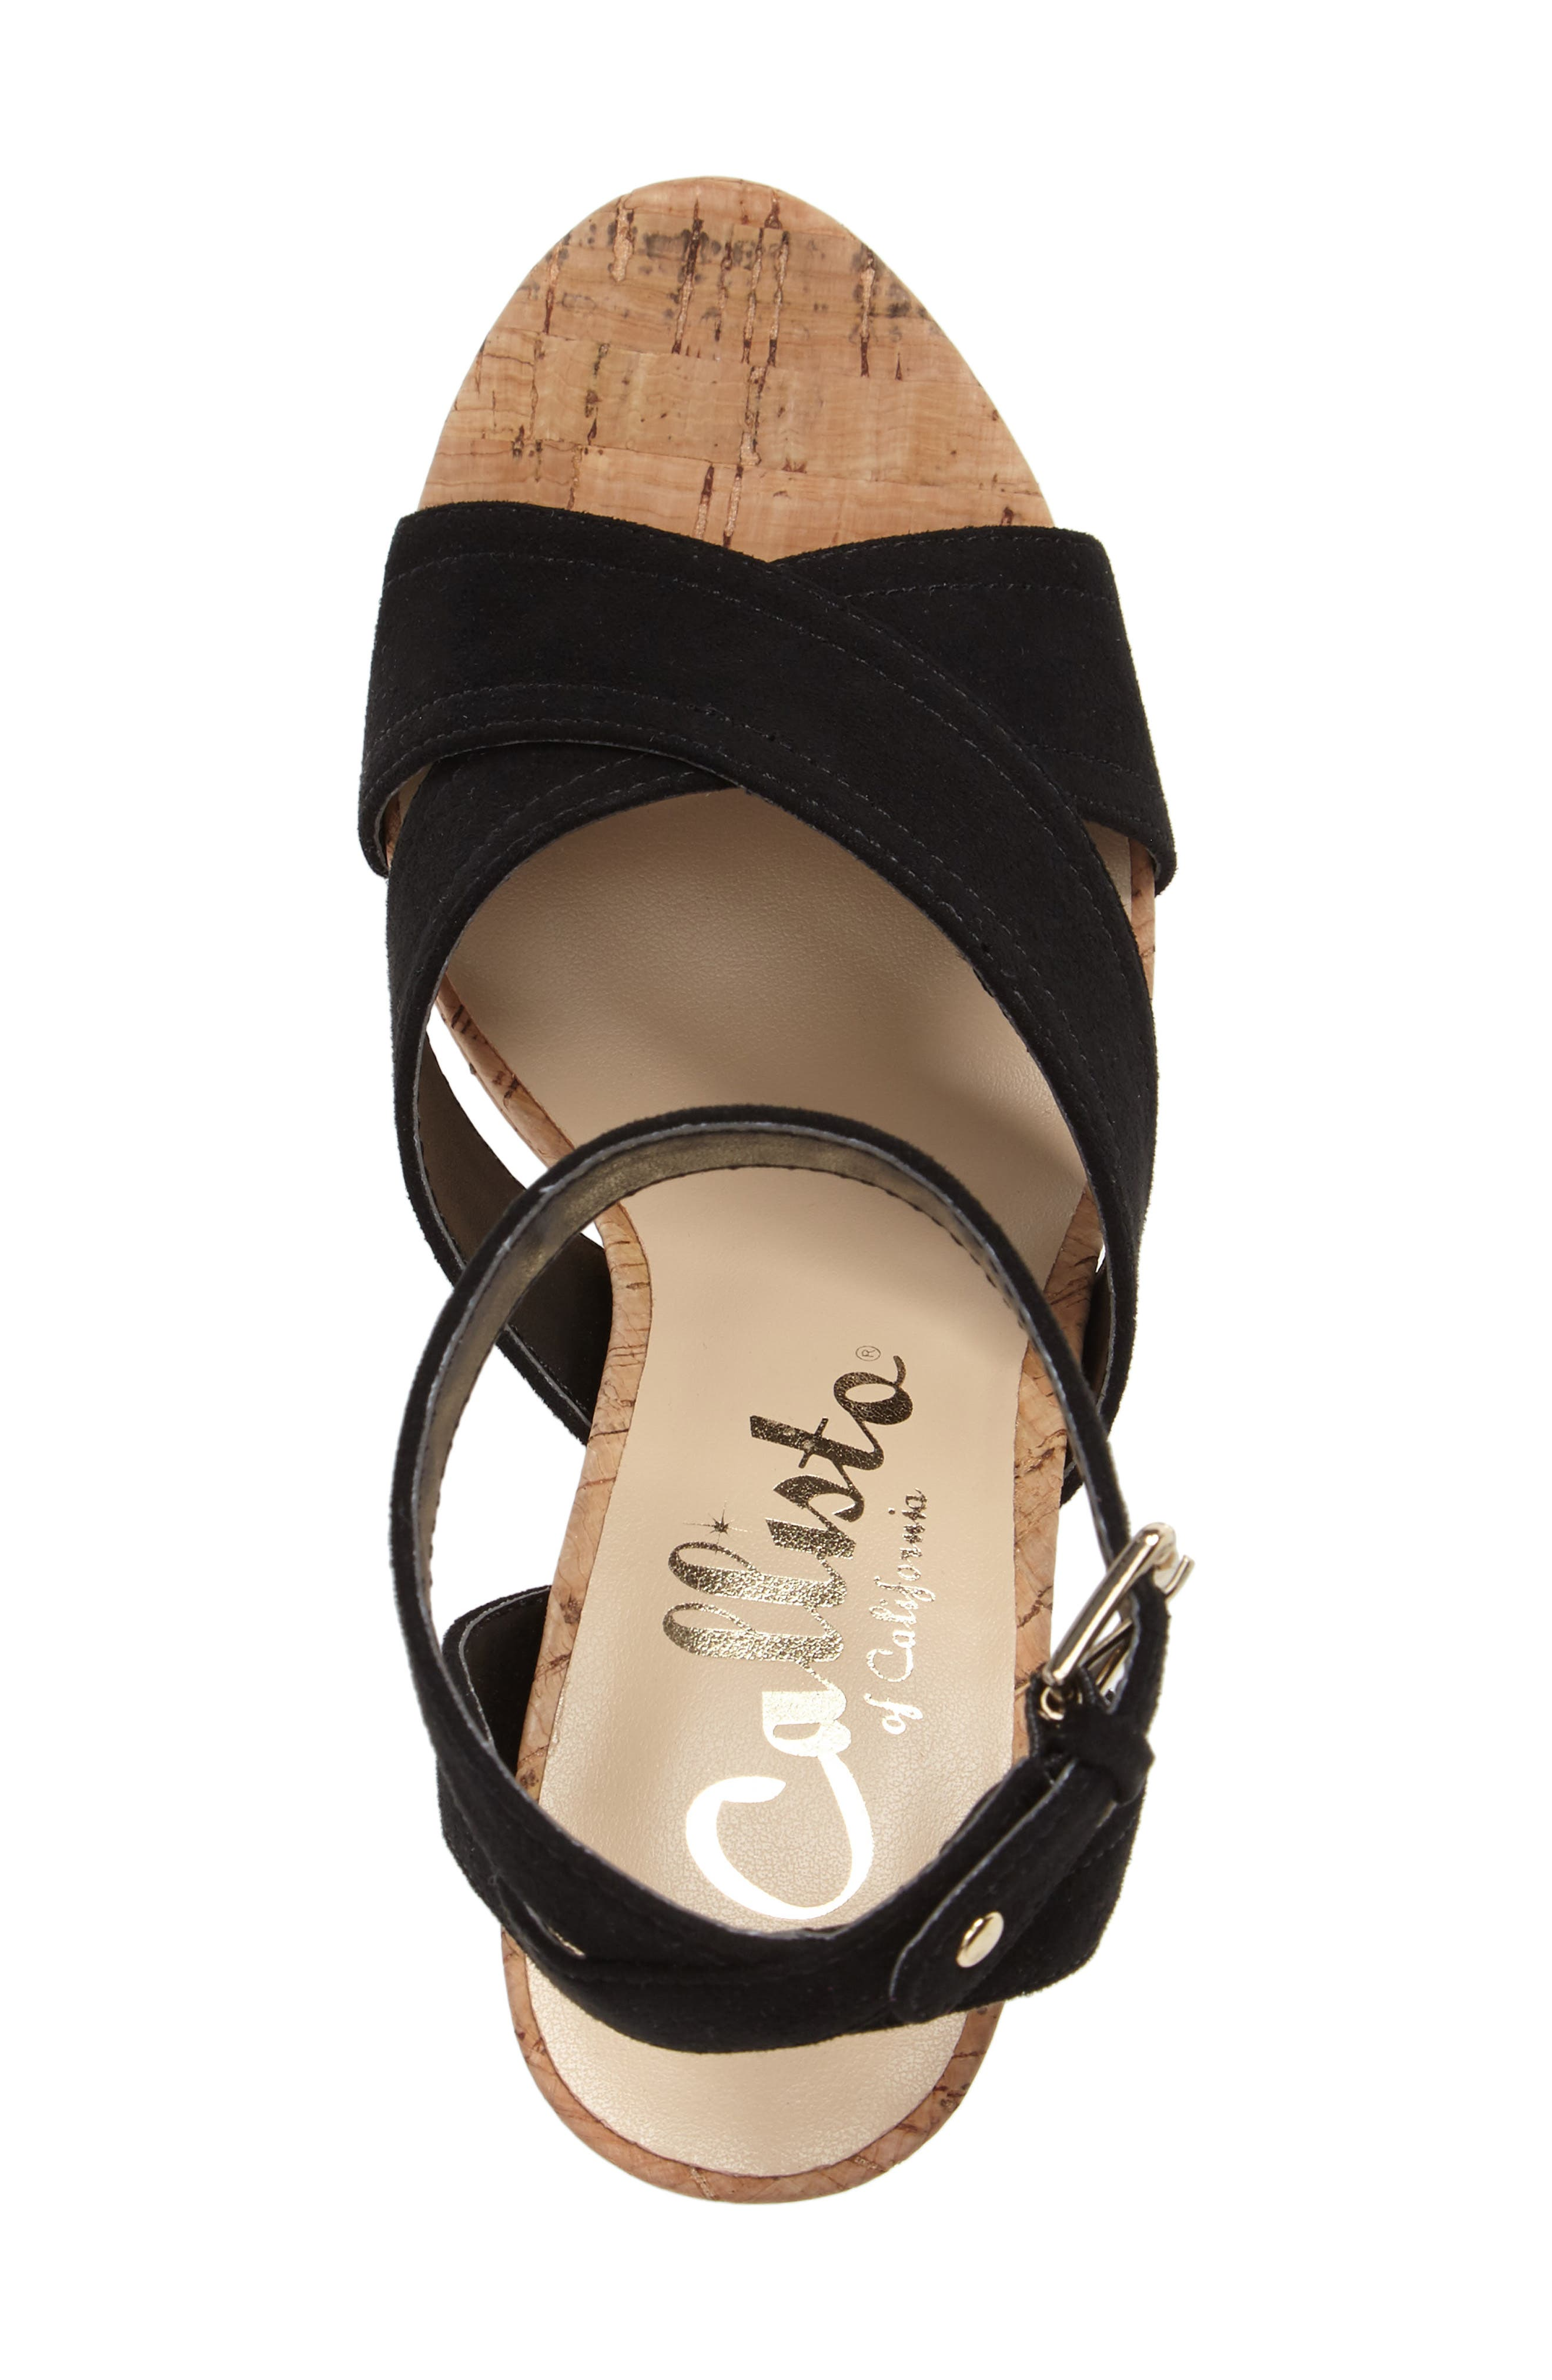 Windye Platform Ankle Strap Sandal,                             Alternate thumbnail 3, color,                             003